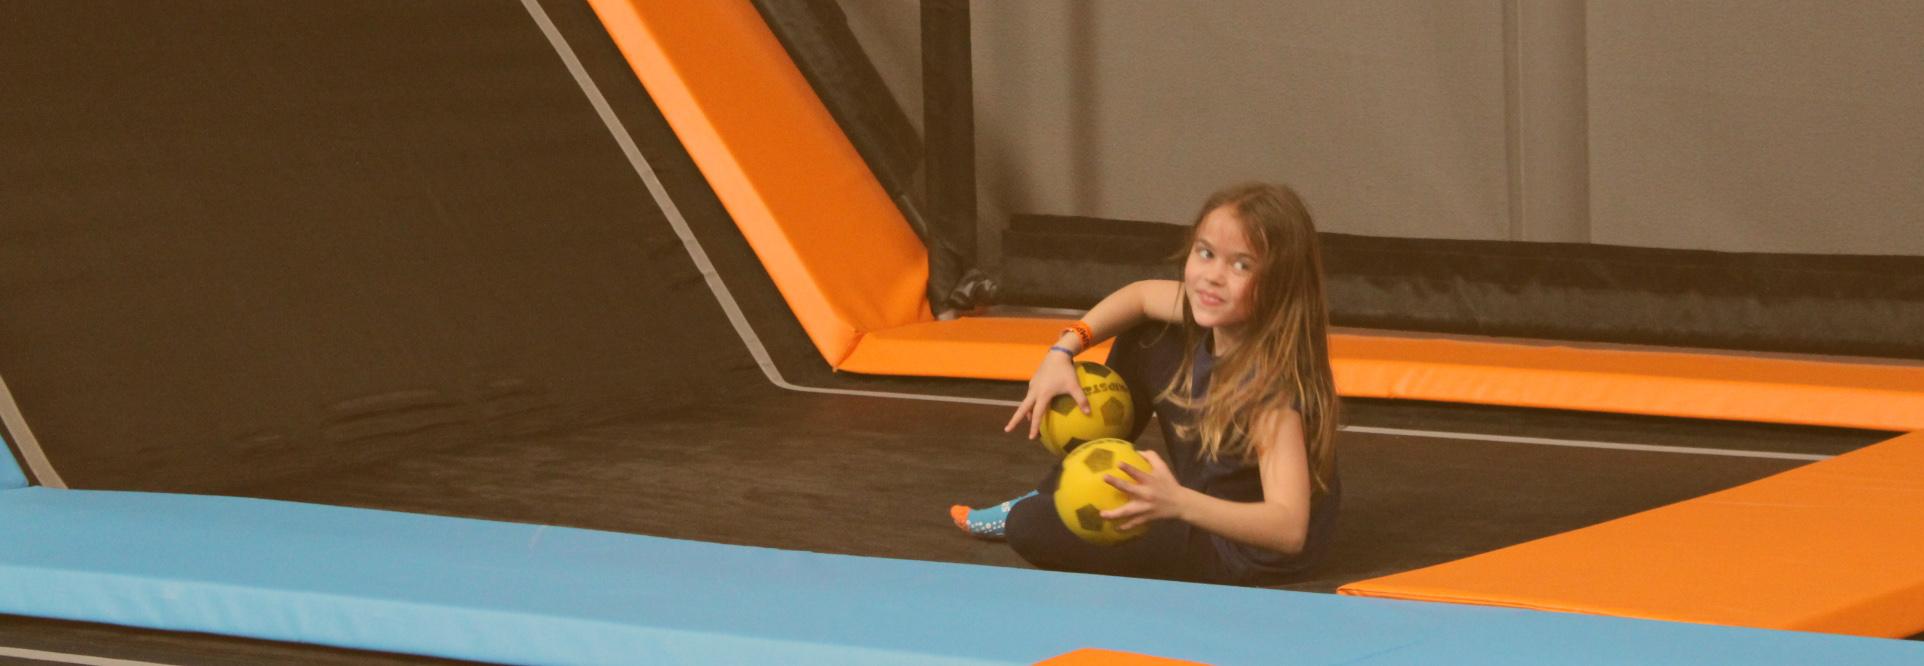 dia-da-criana-jumpers-trampolim-porto.jpg